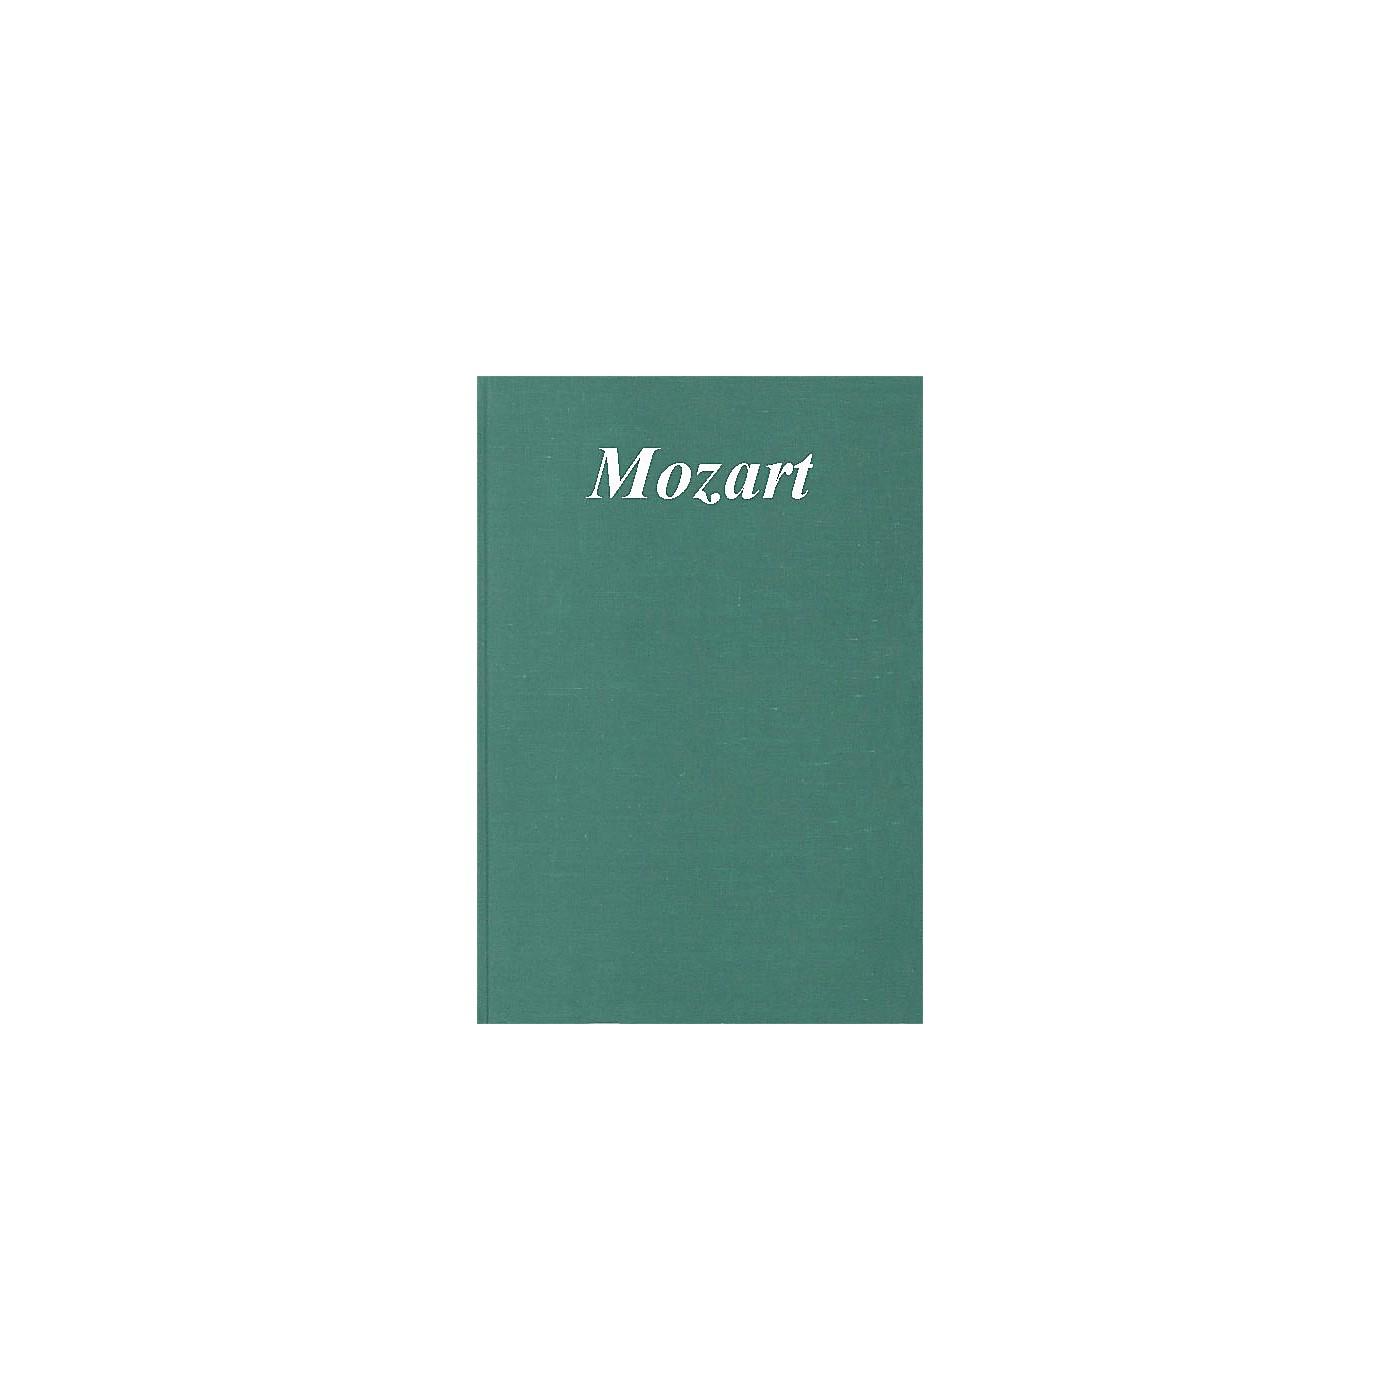 G. Henle Verlag Wolfgang Amadeus Mozart - Autographe Und Abschriften Henle Books Series Hardcover thumbnail